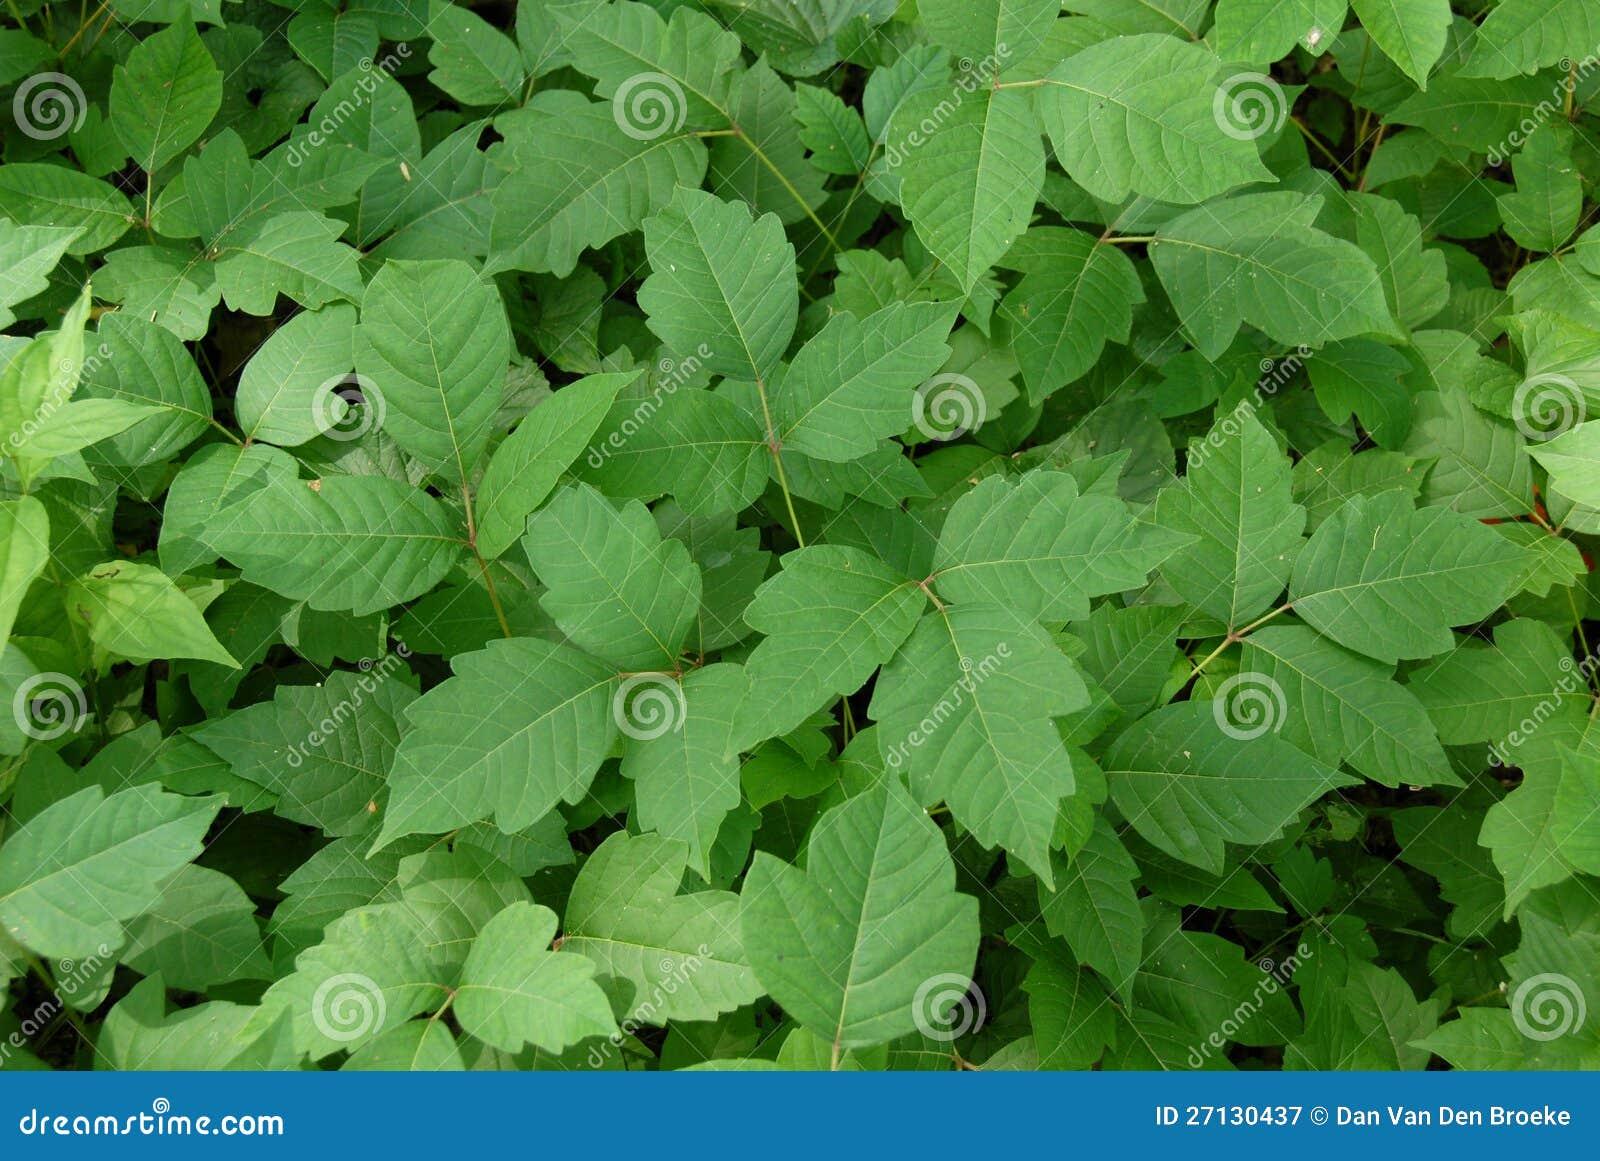 Poison ivy (disambiguation)